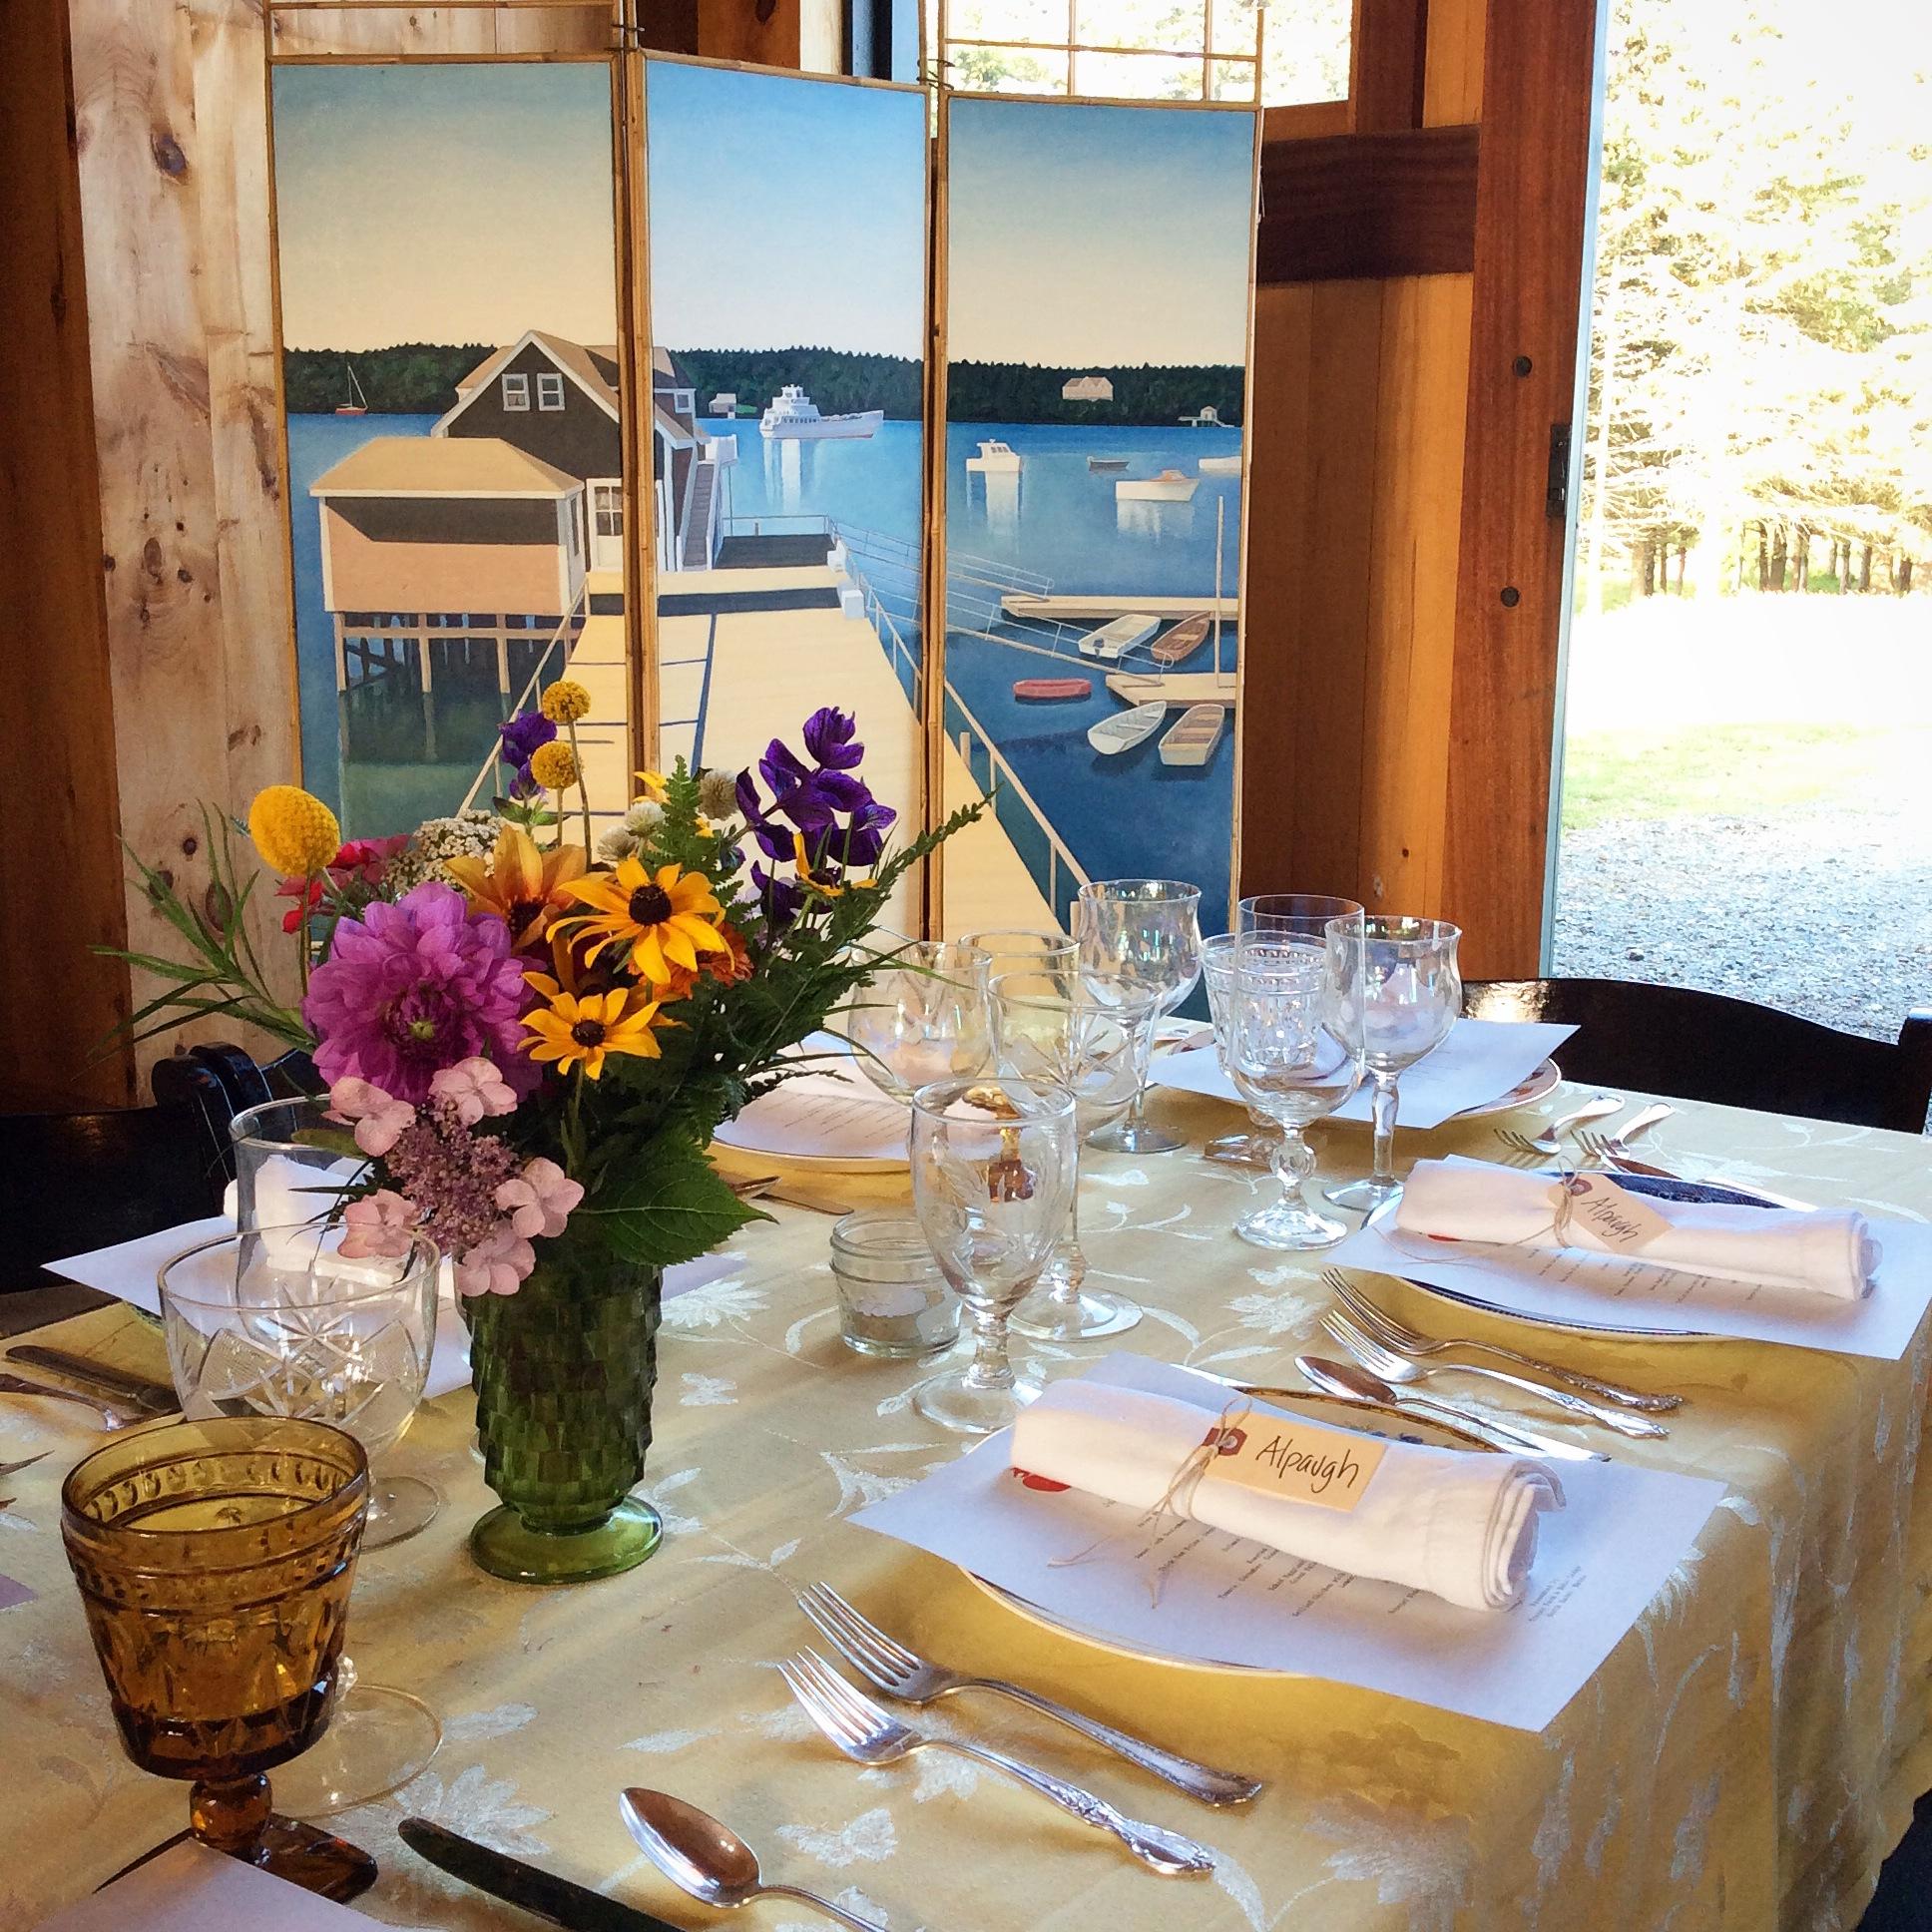 Nebo Lodge Barn Supper